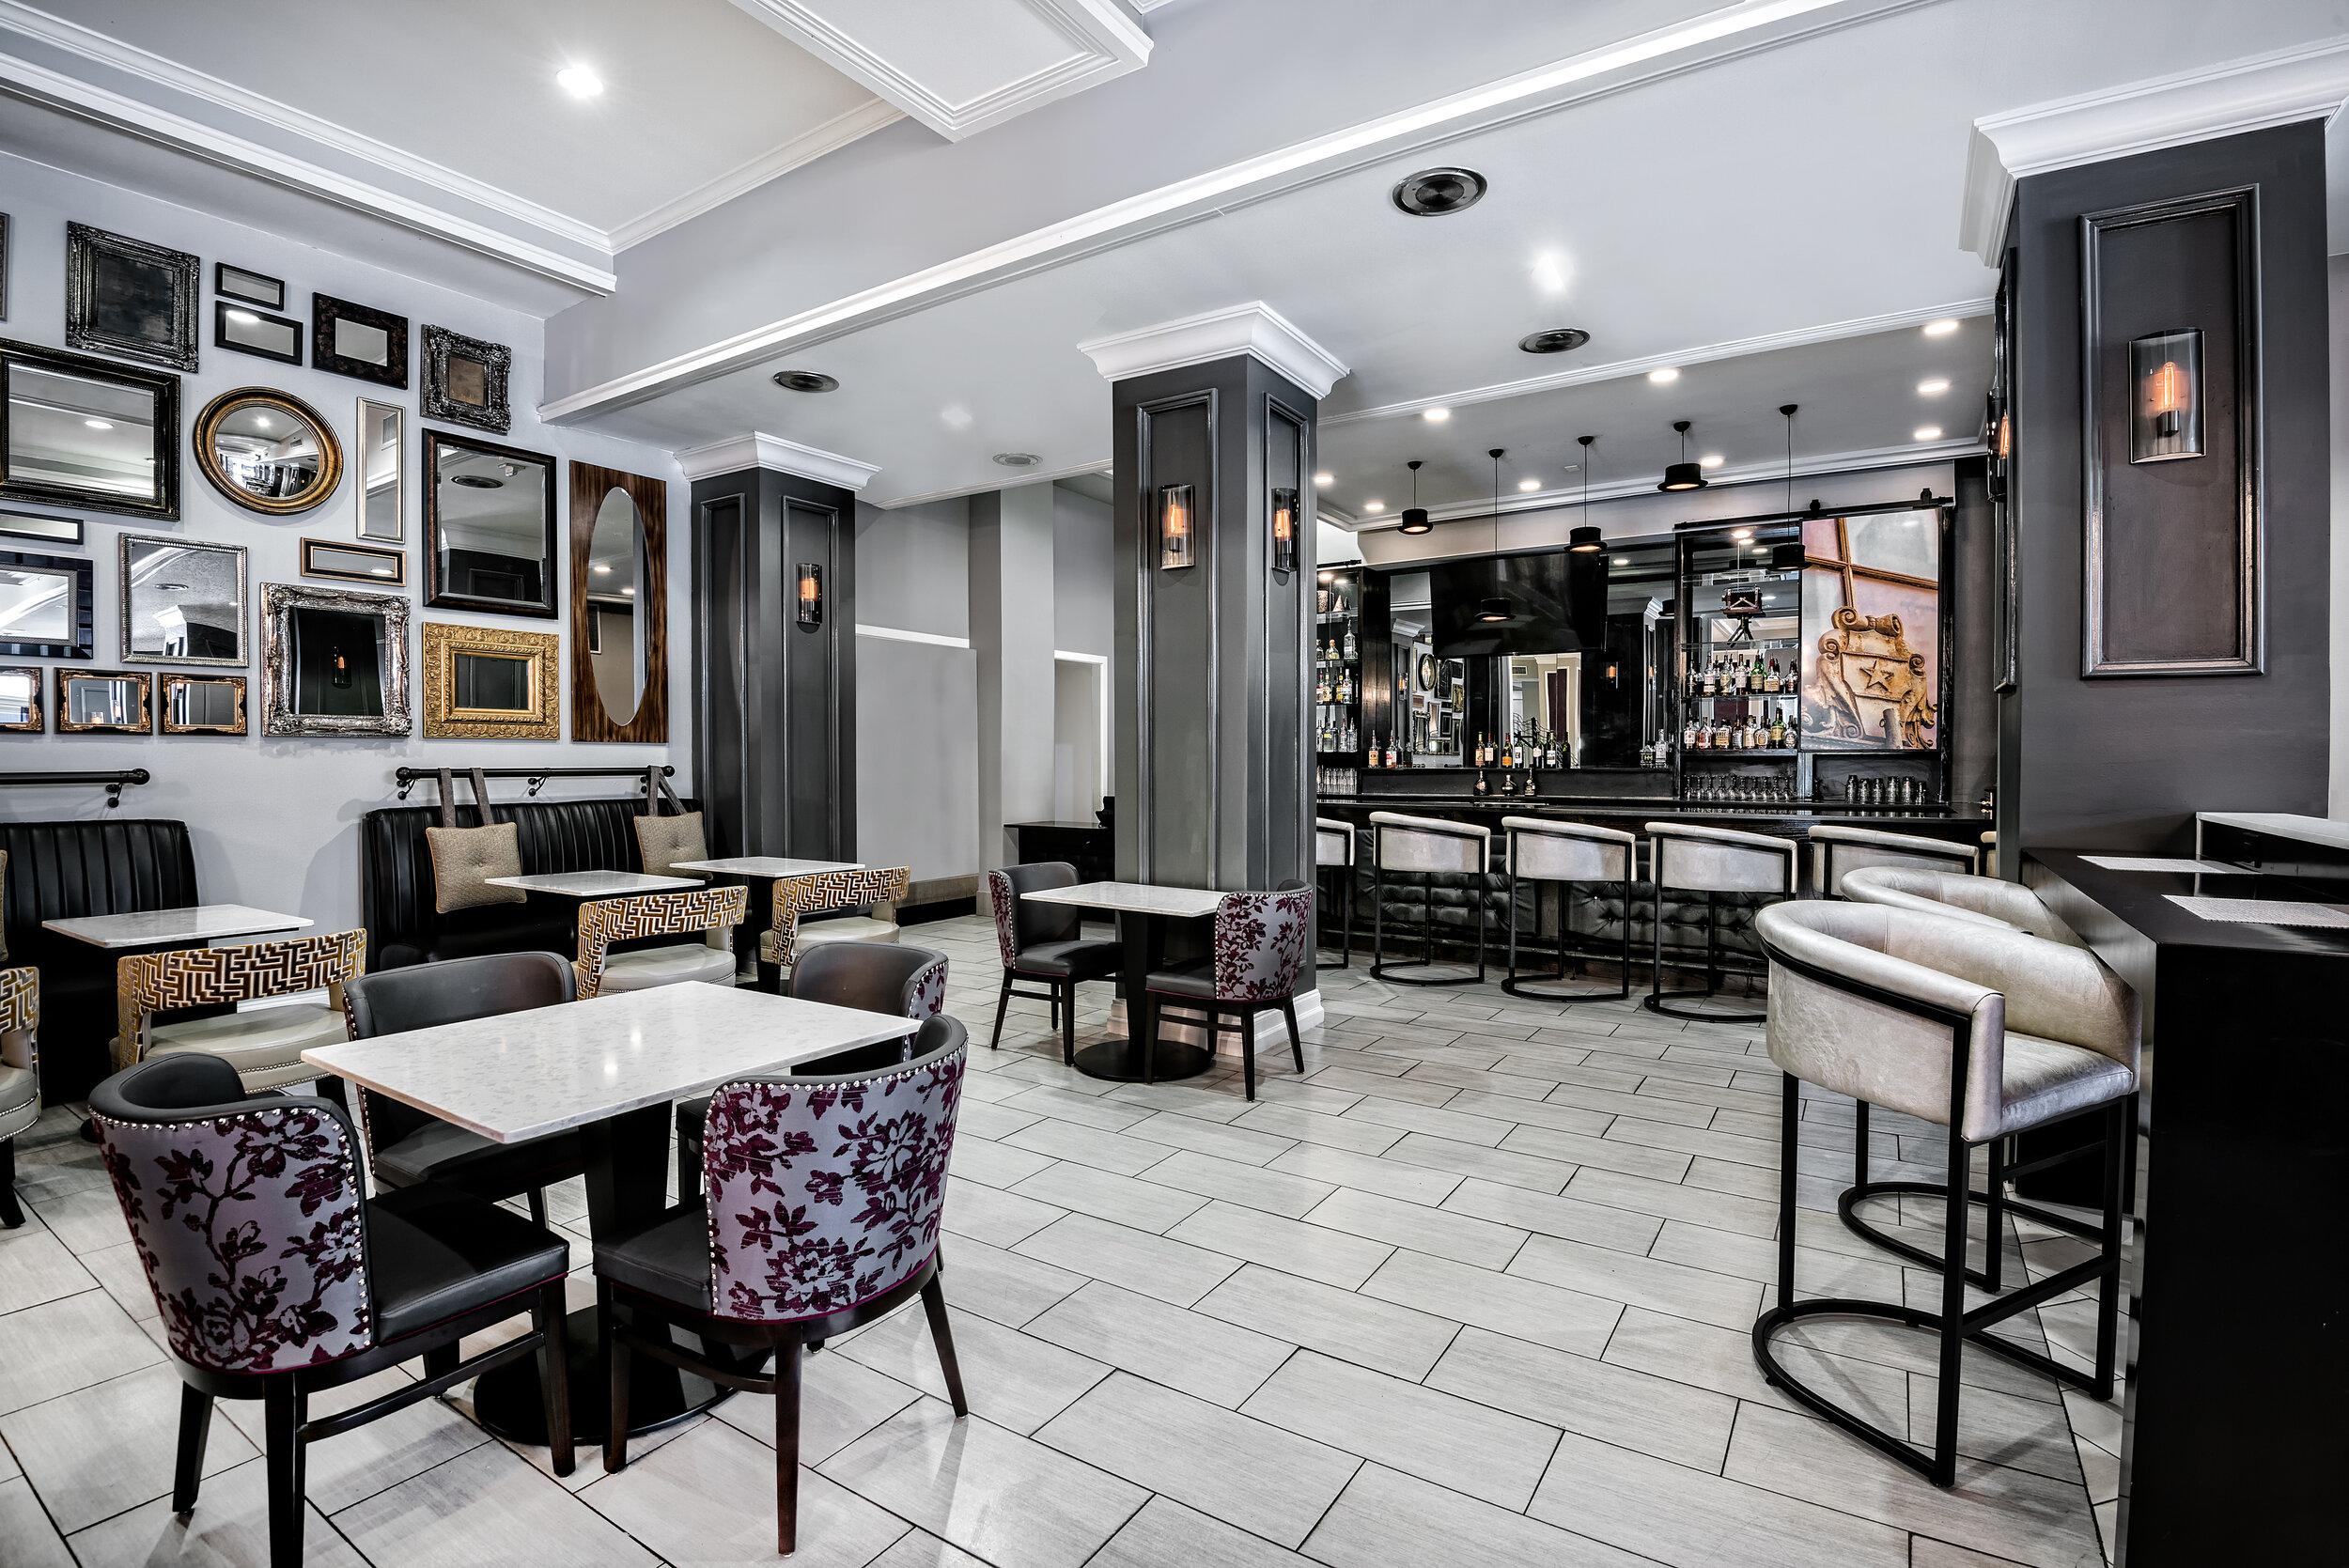 dalar-hotel-indigo-dallas-downtown-bar2.jpg